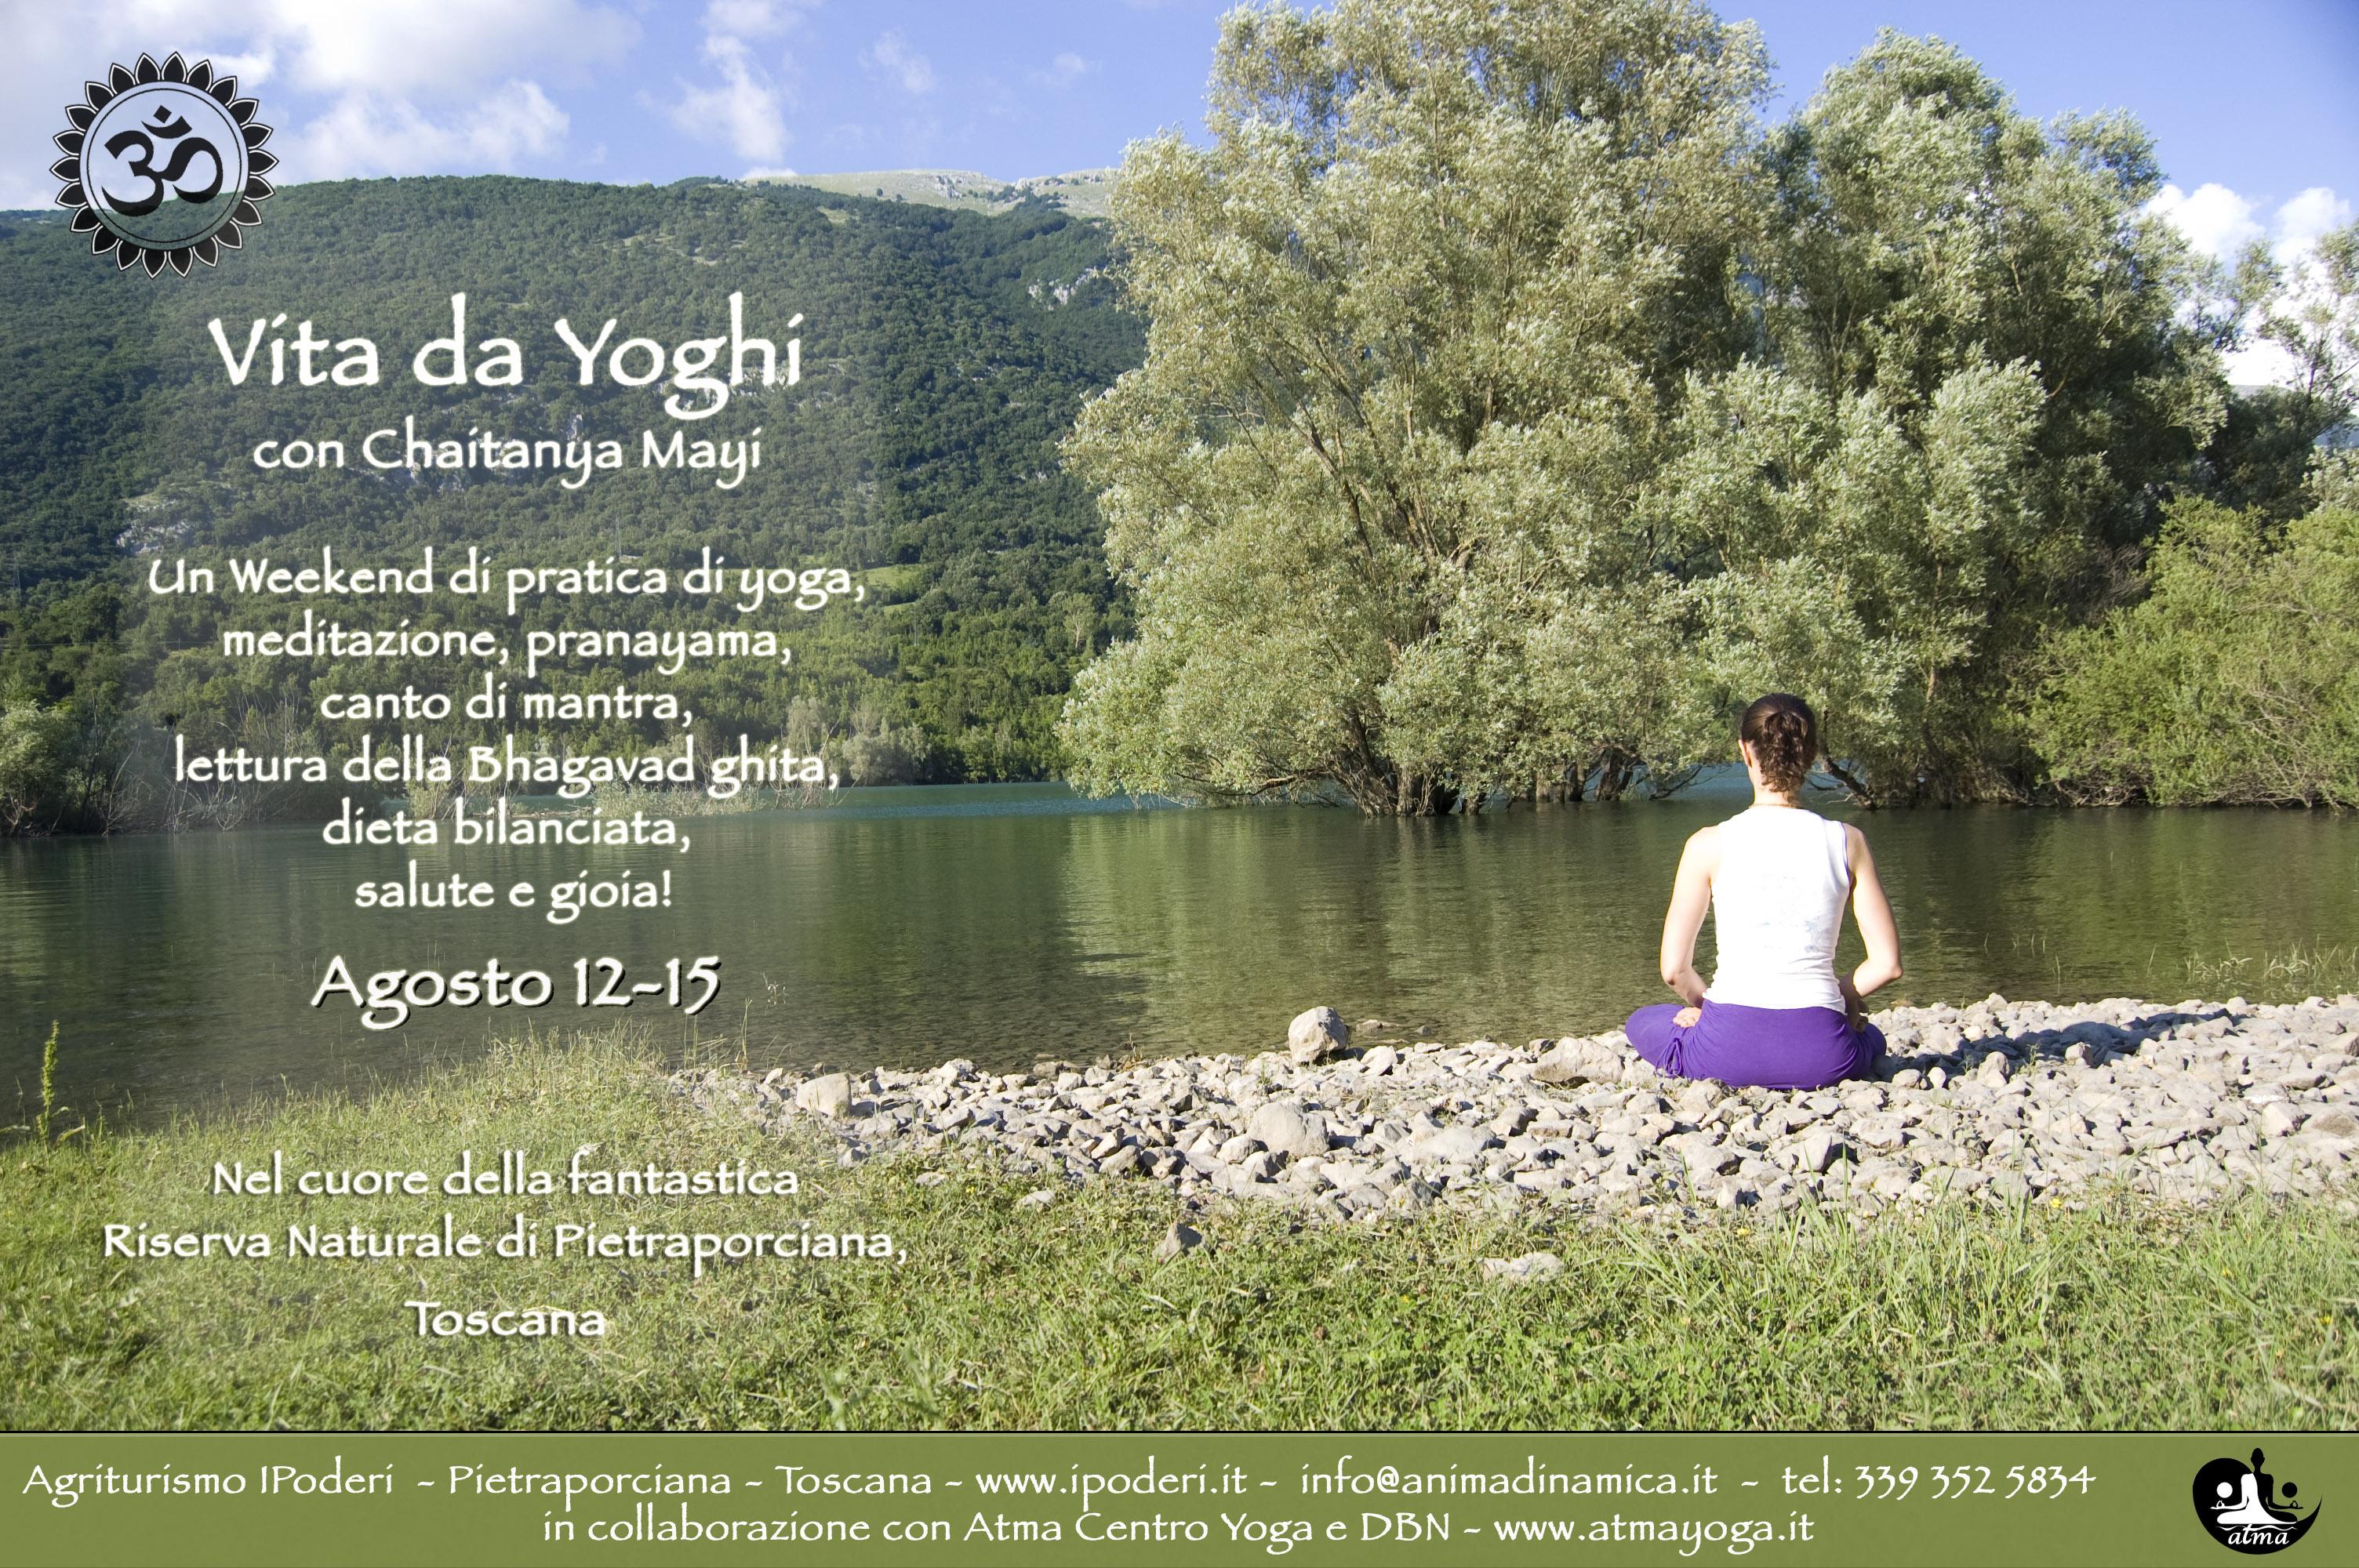 12-15 agosto 2016 Chaitanya Mayi e una vita da Yoghi